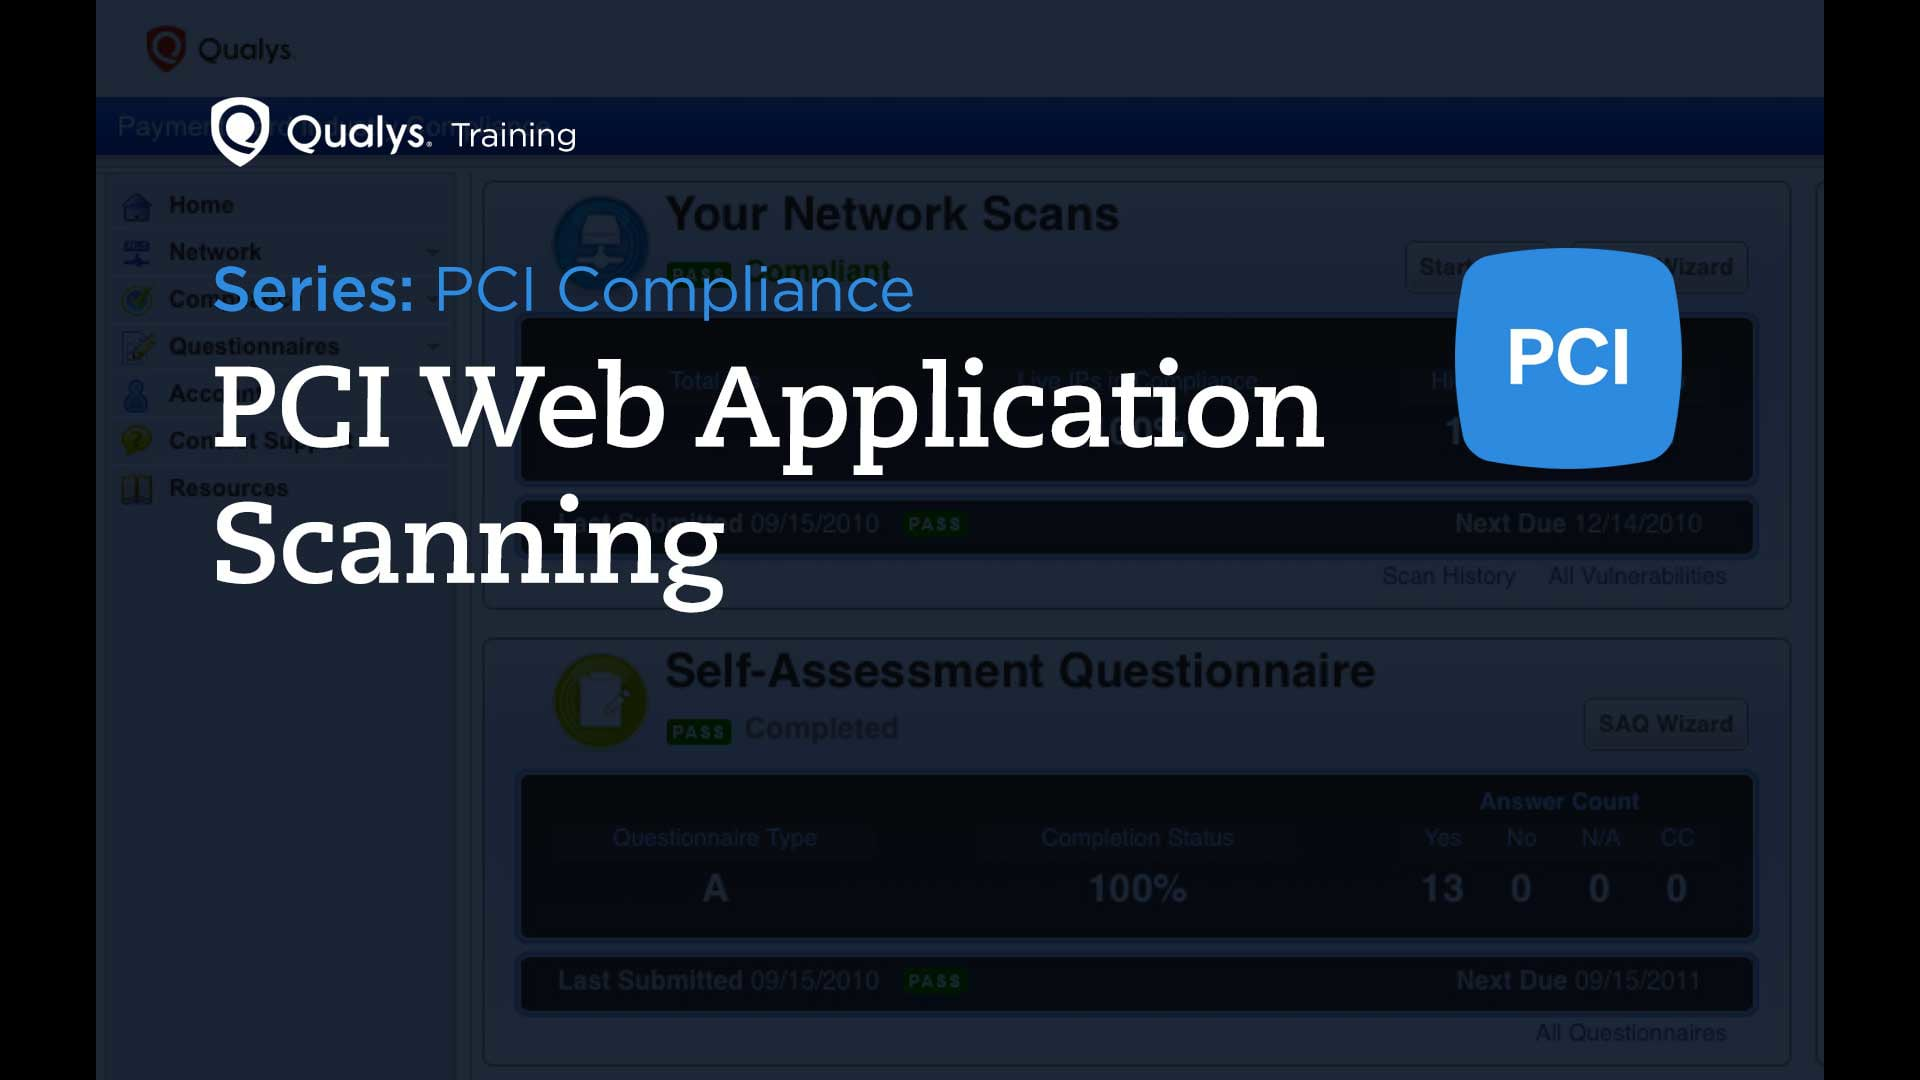 PCI Web Application Scanning